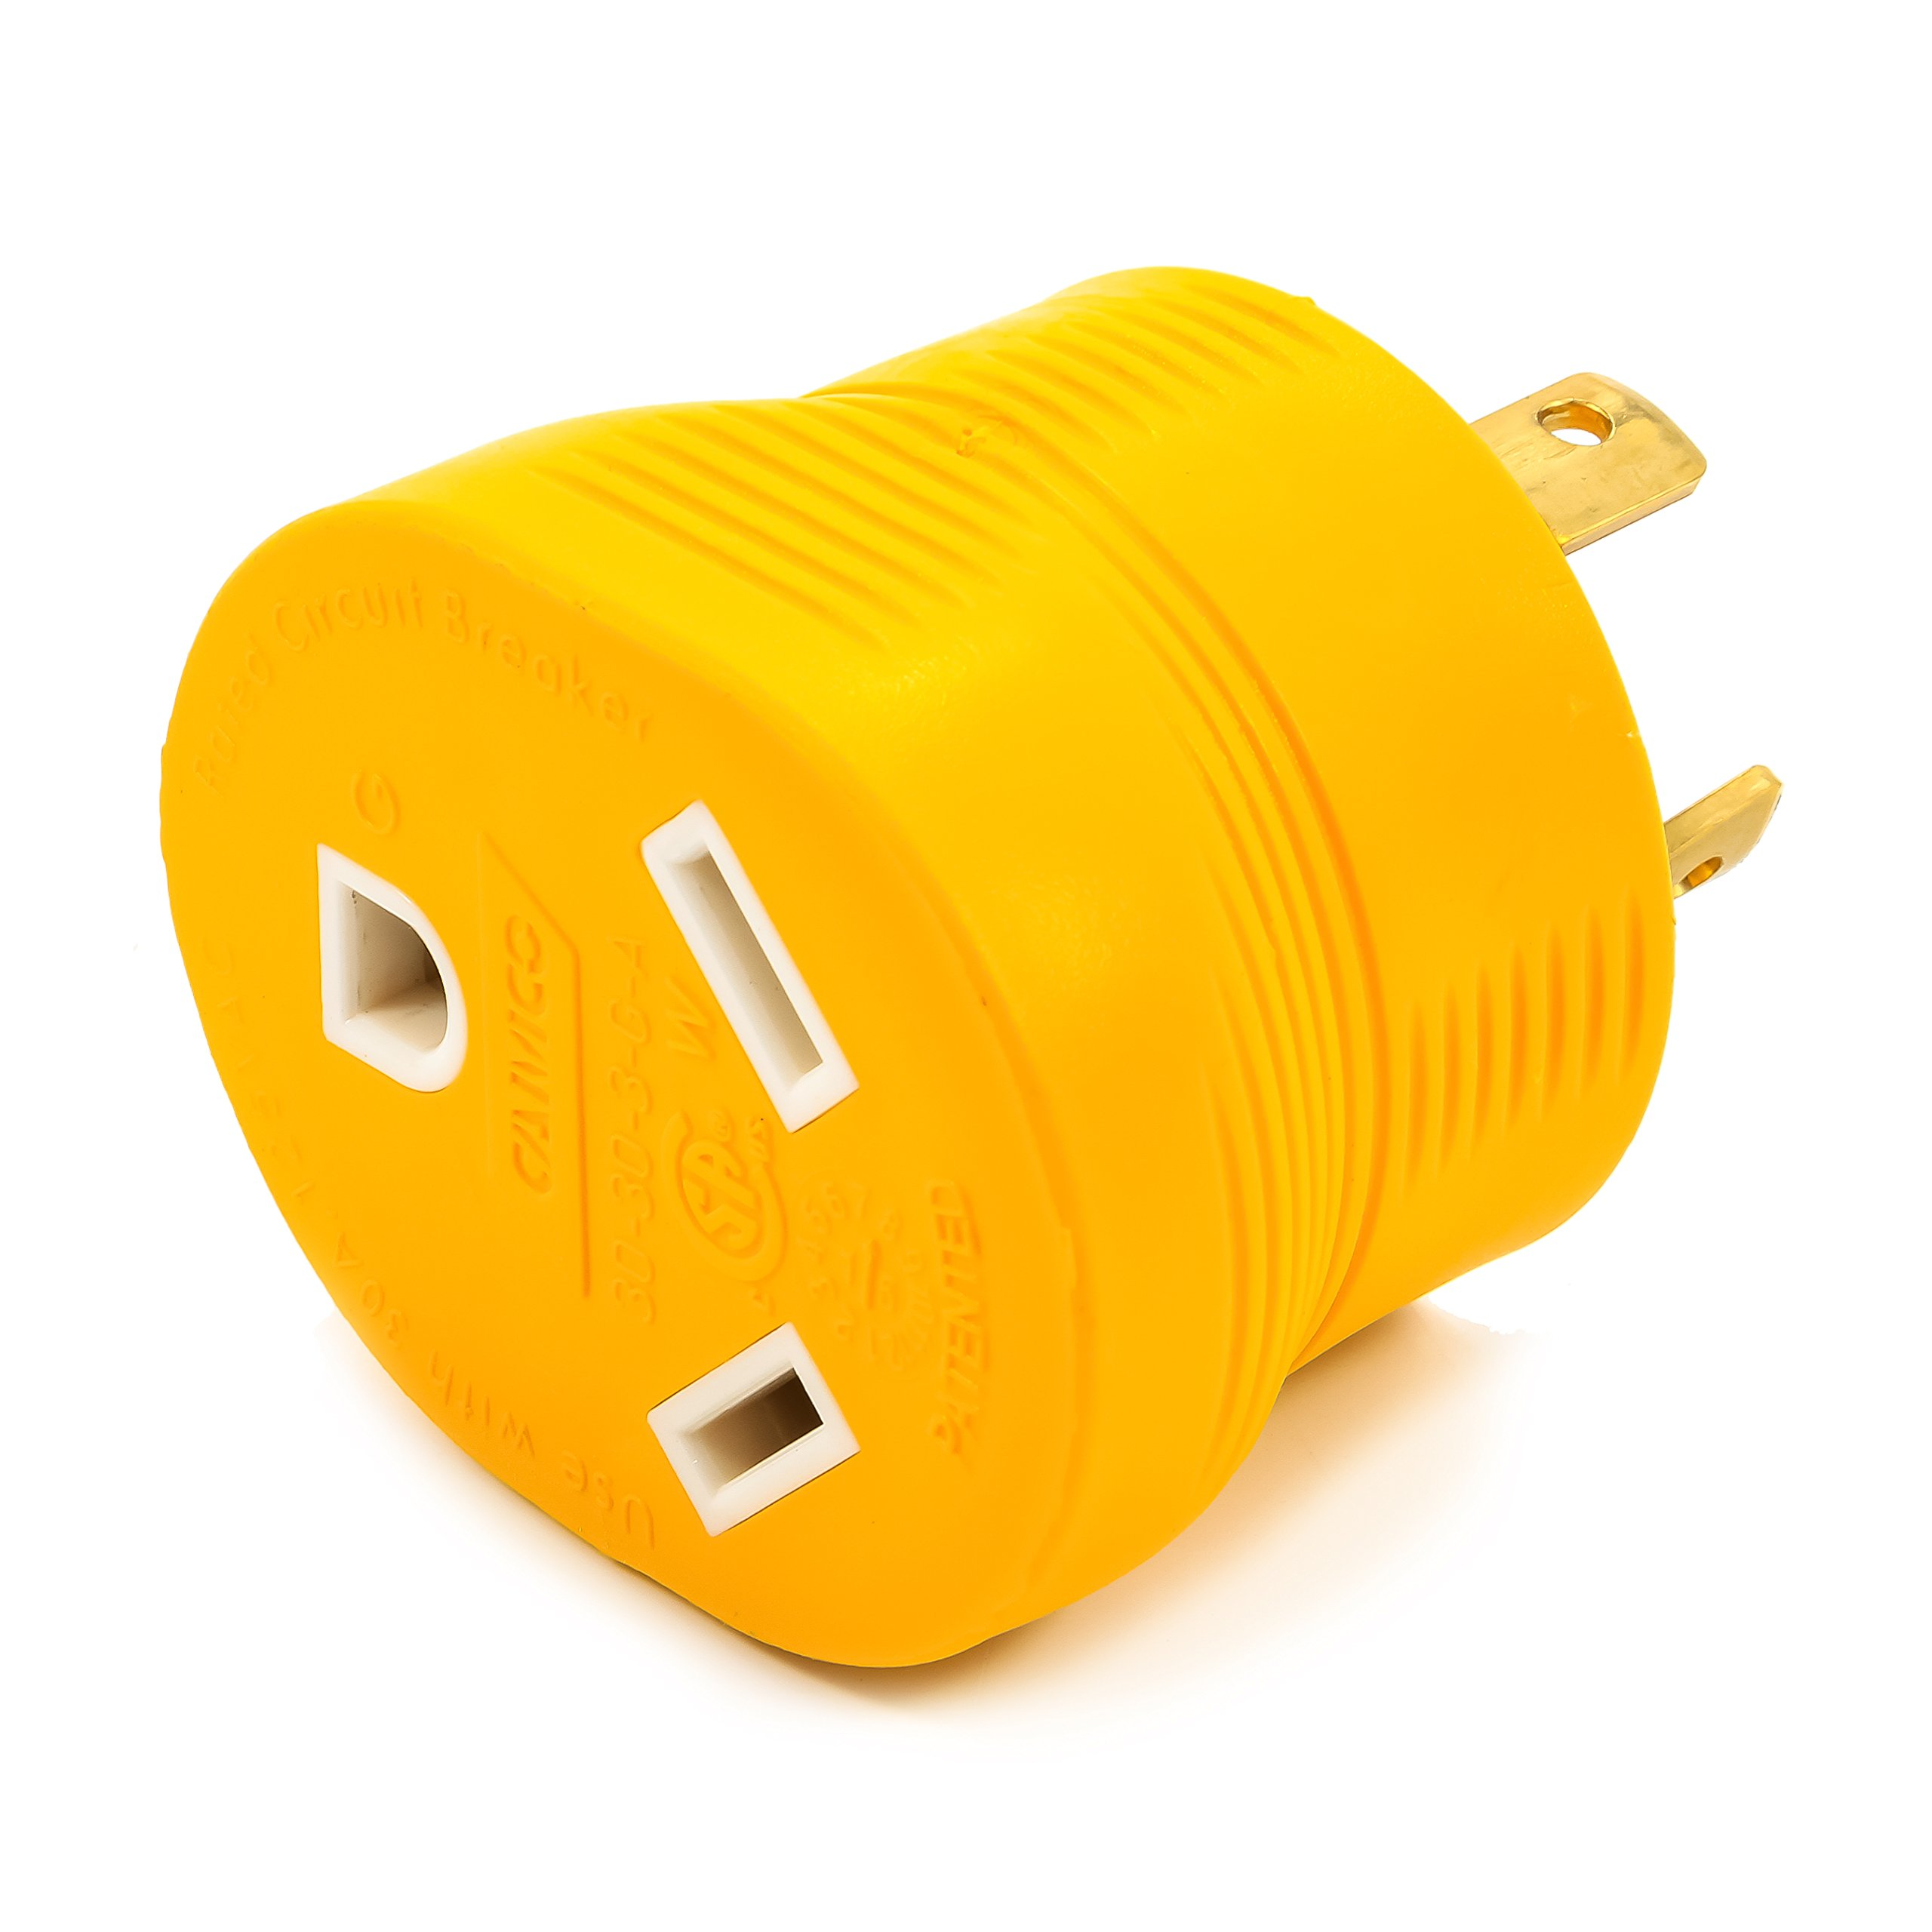 Camco Non-Slip Grip Three-Prong Generator Adapter, Designed For RV Generators- 30 AMP (55333)